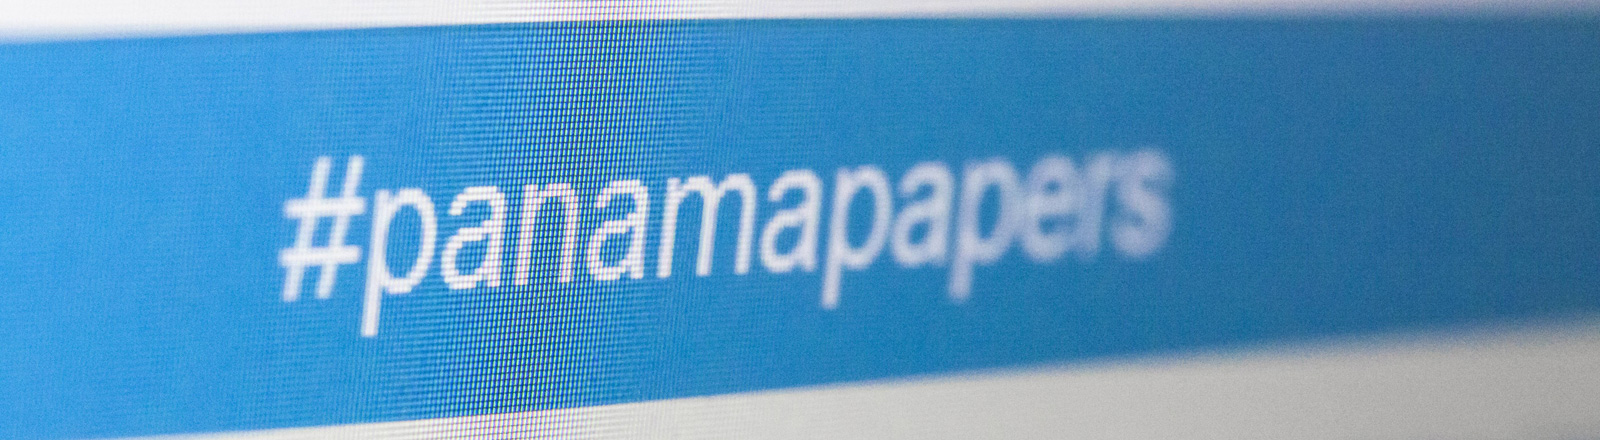 Hashtag Panamapapers